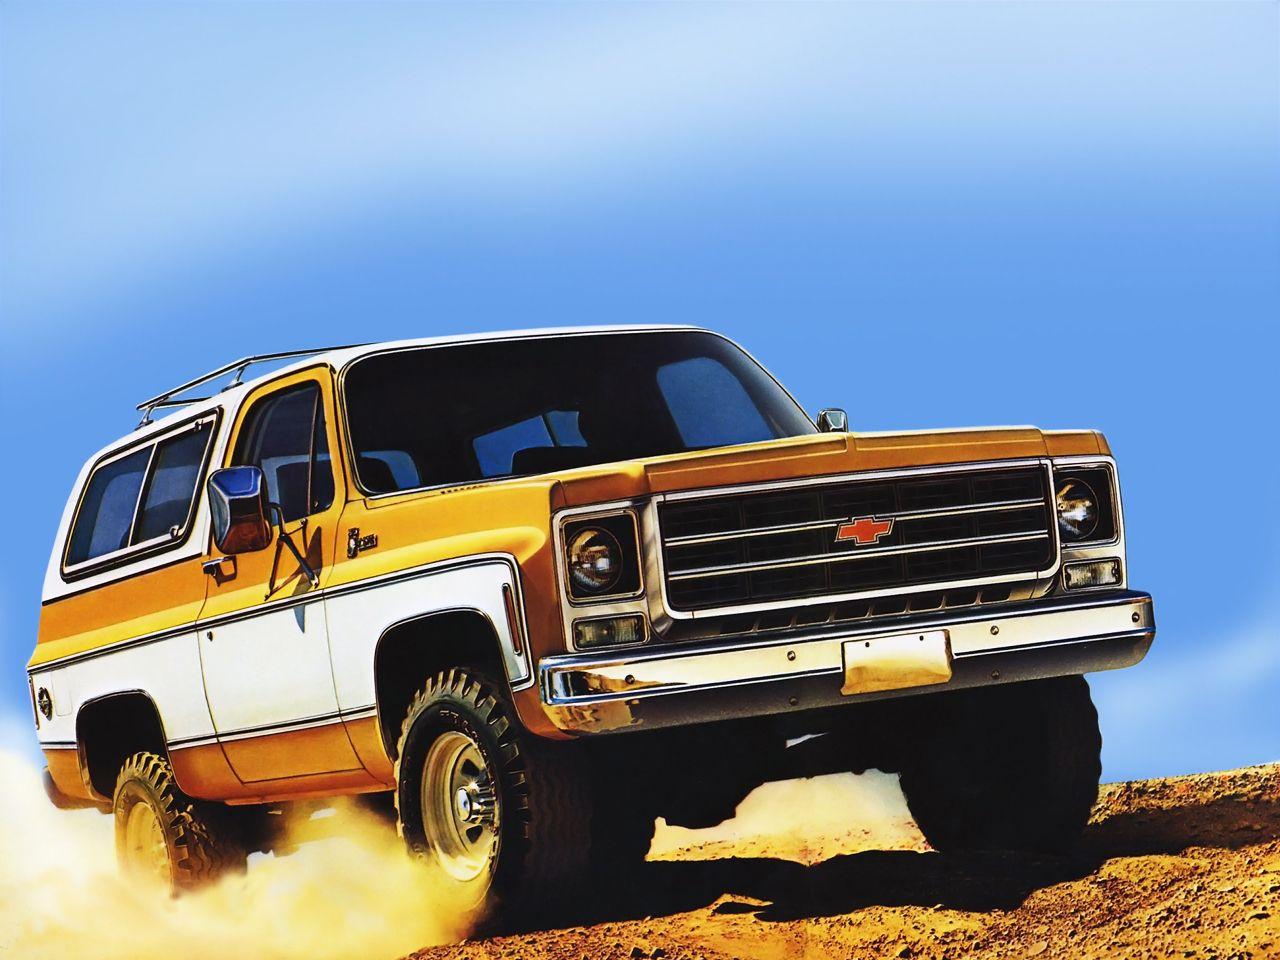 Blazer Power | Mud/Dirt/Mountain/Desert Worthy 4x4's | Pinterest ...